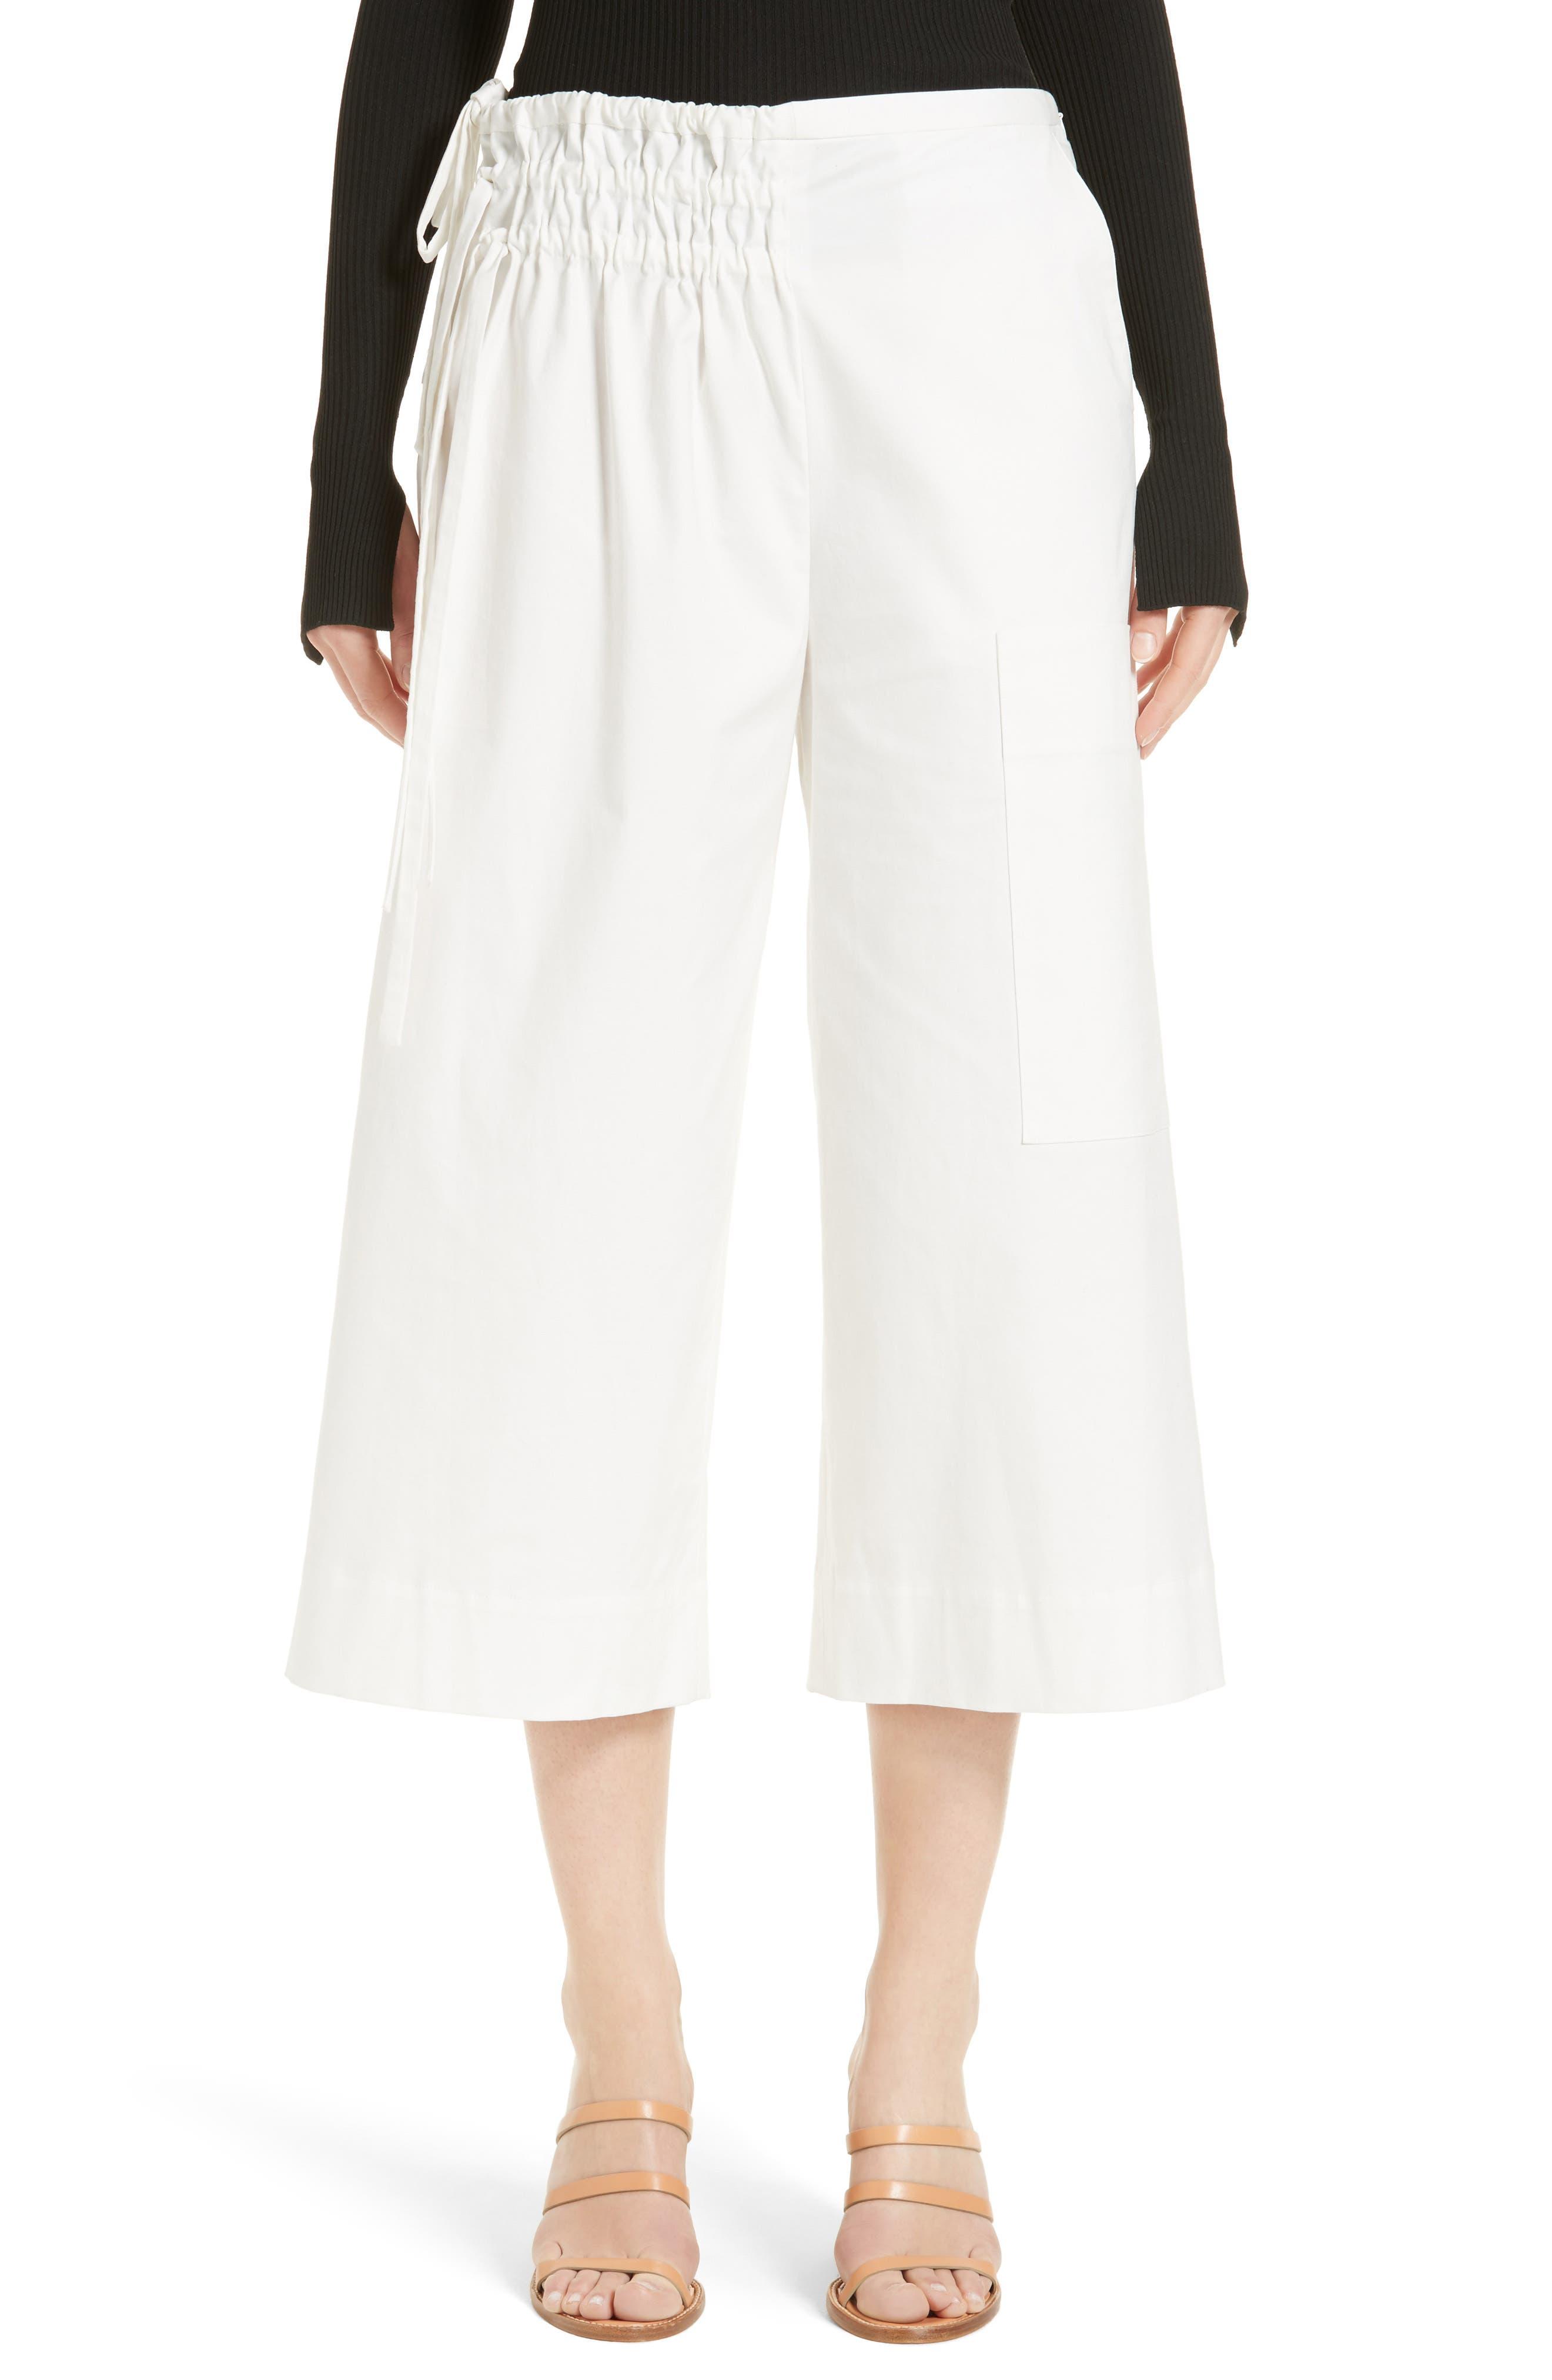 Alternate Image 1 Selected - Tibi Esteban Crop Twill Pants